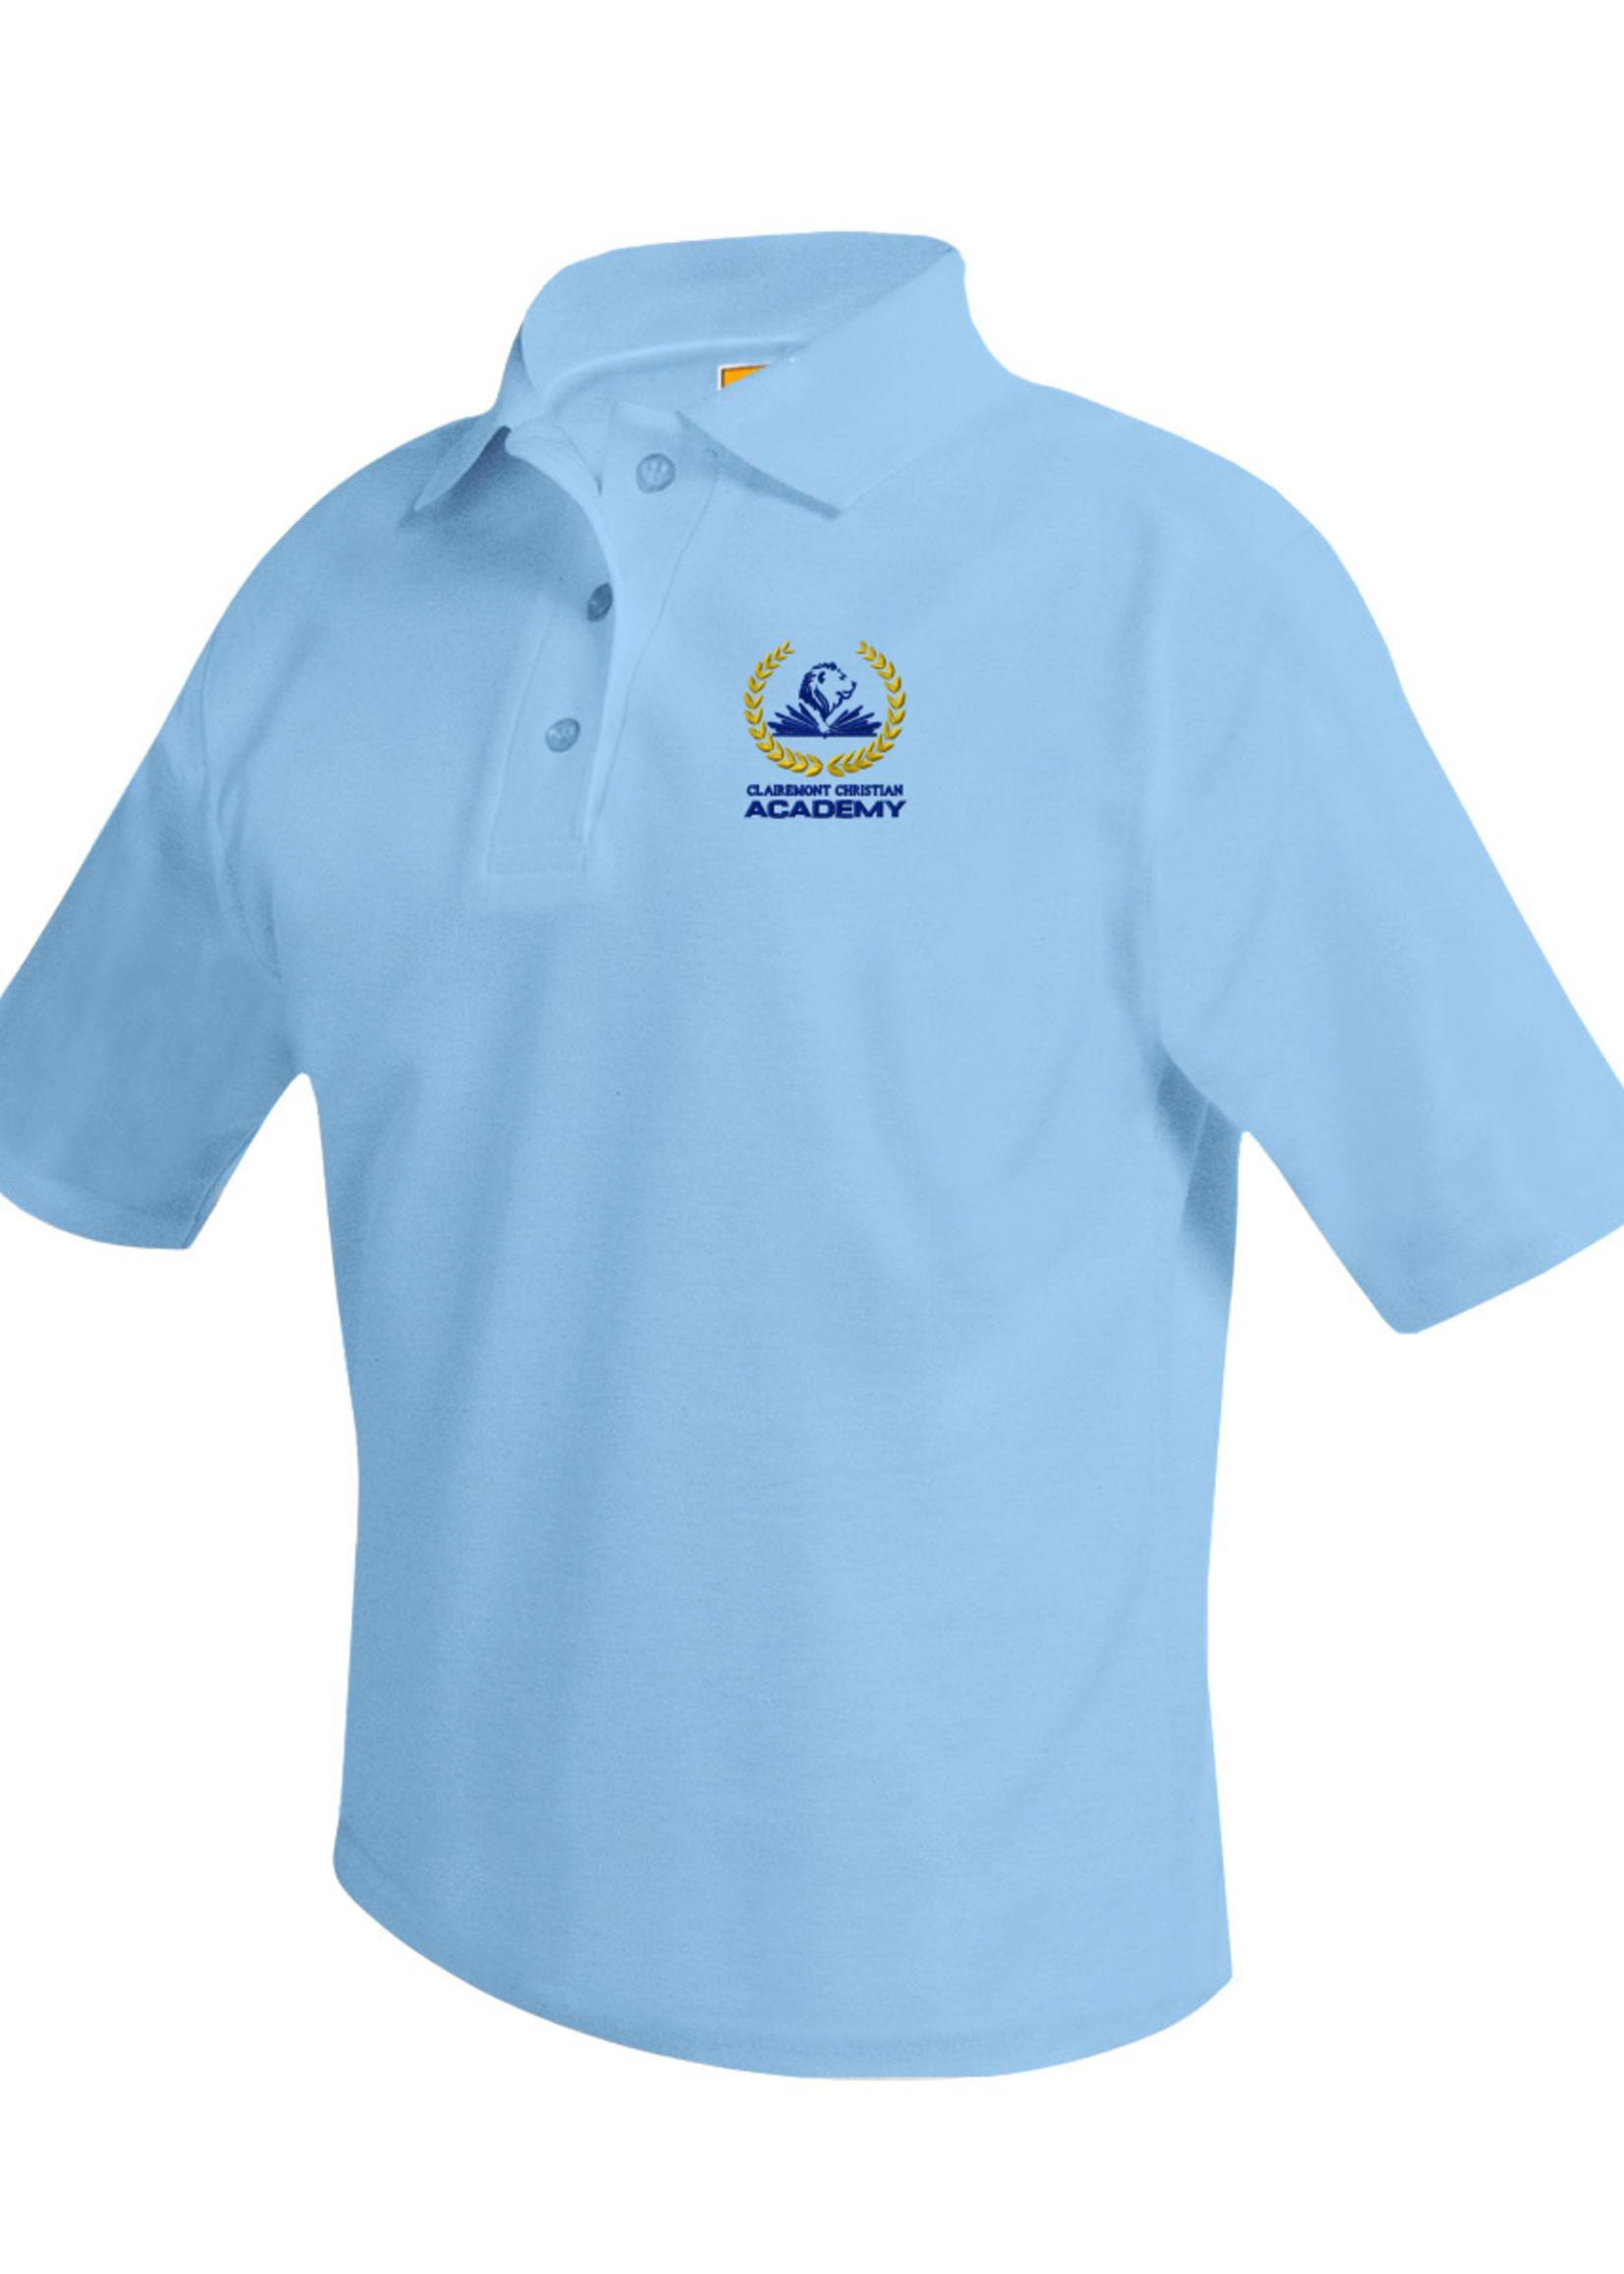 TUS CLCA GK6 Lt. Blue Short Sleeve Pique Polo